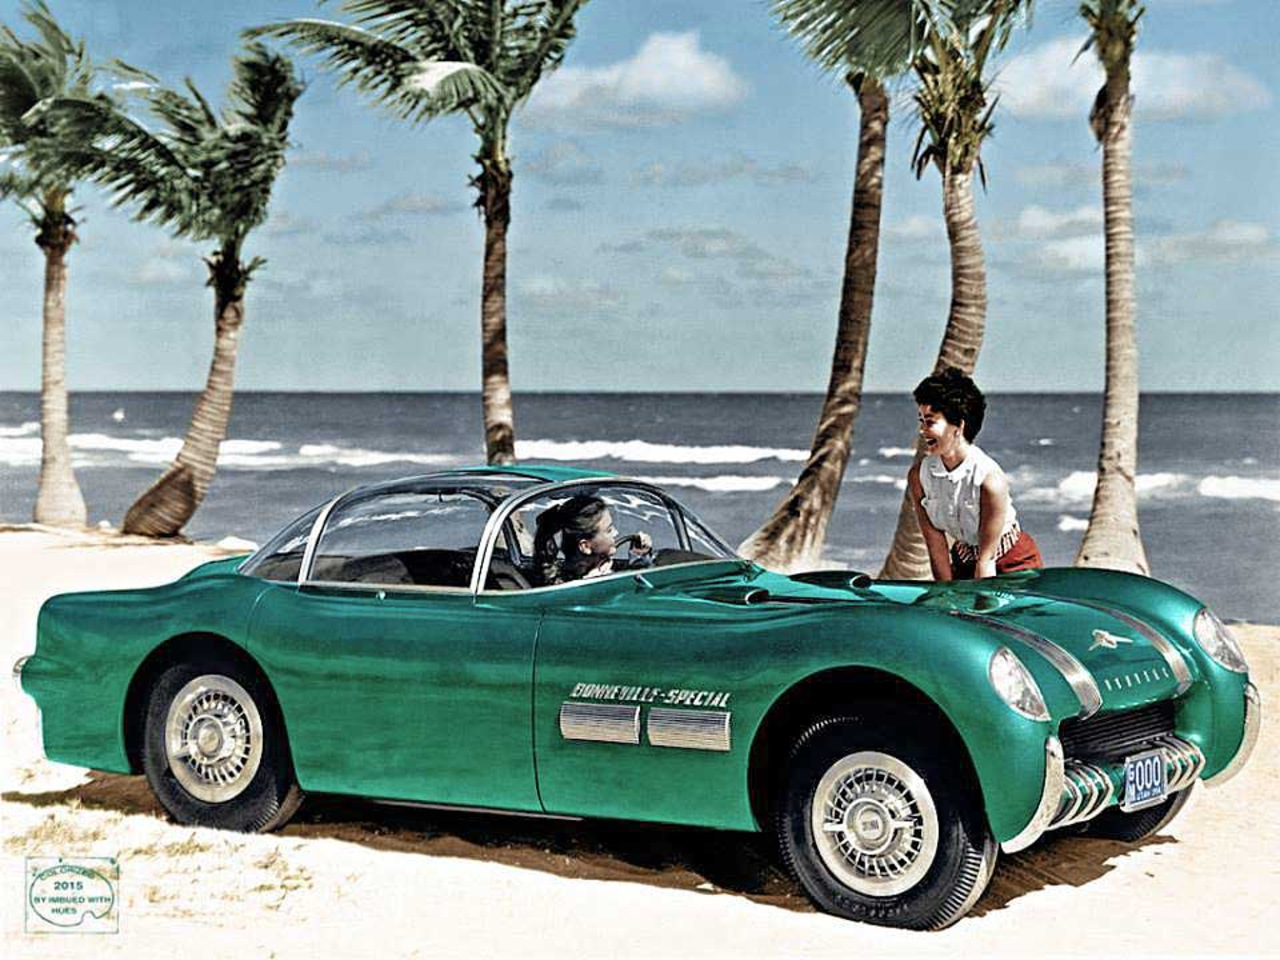 1954 Pontiac Bonneville Special Motorama Concept general motors, концепт, фотографии